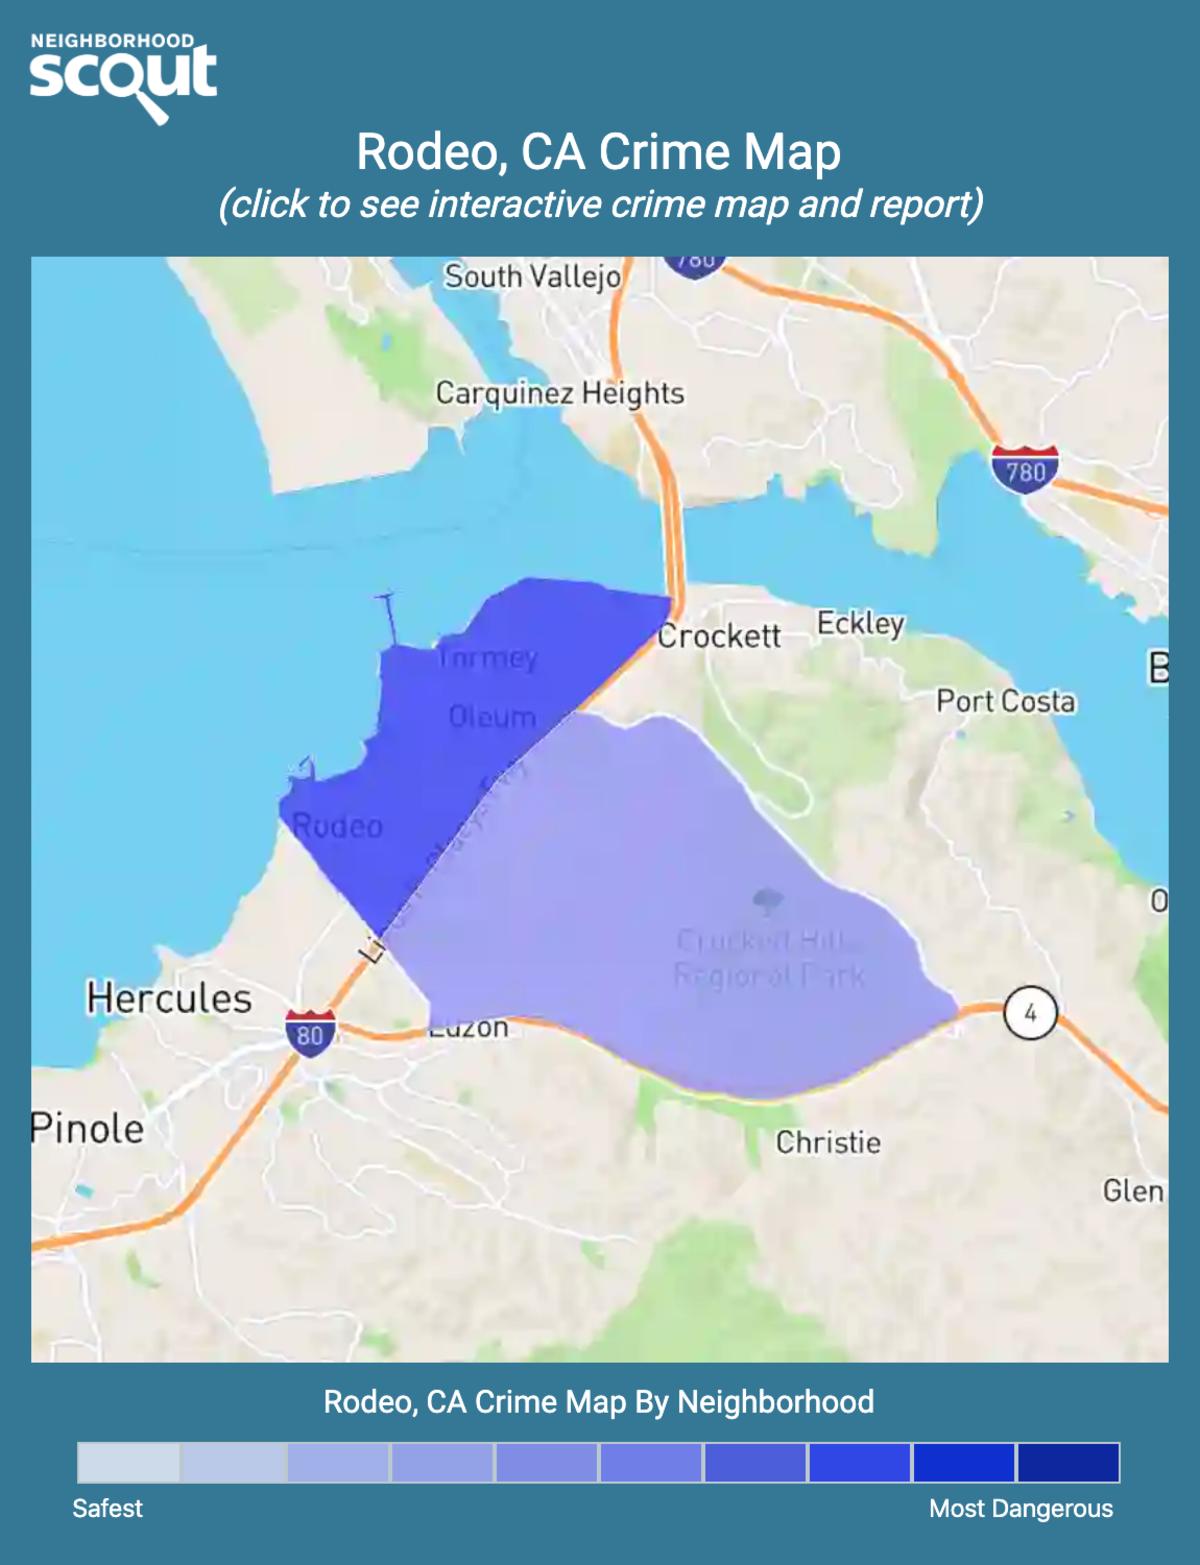 Rodeo, California crime map